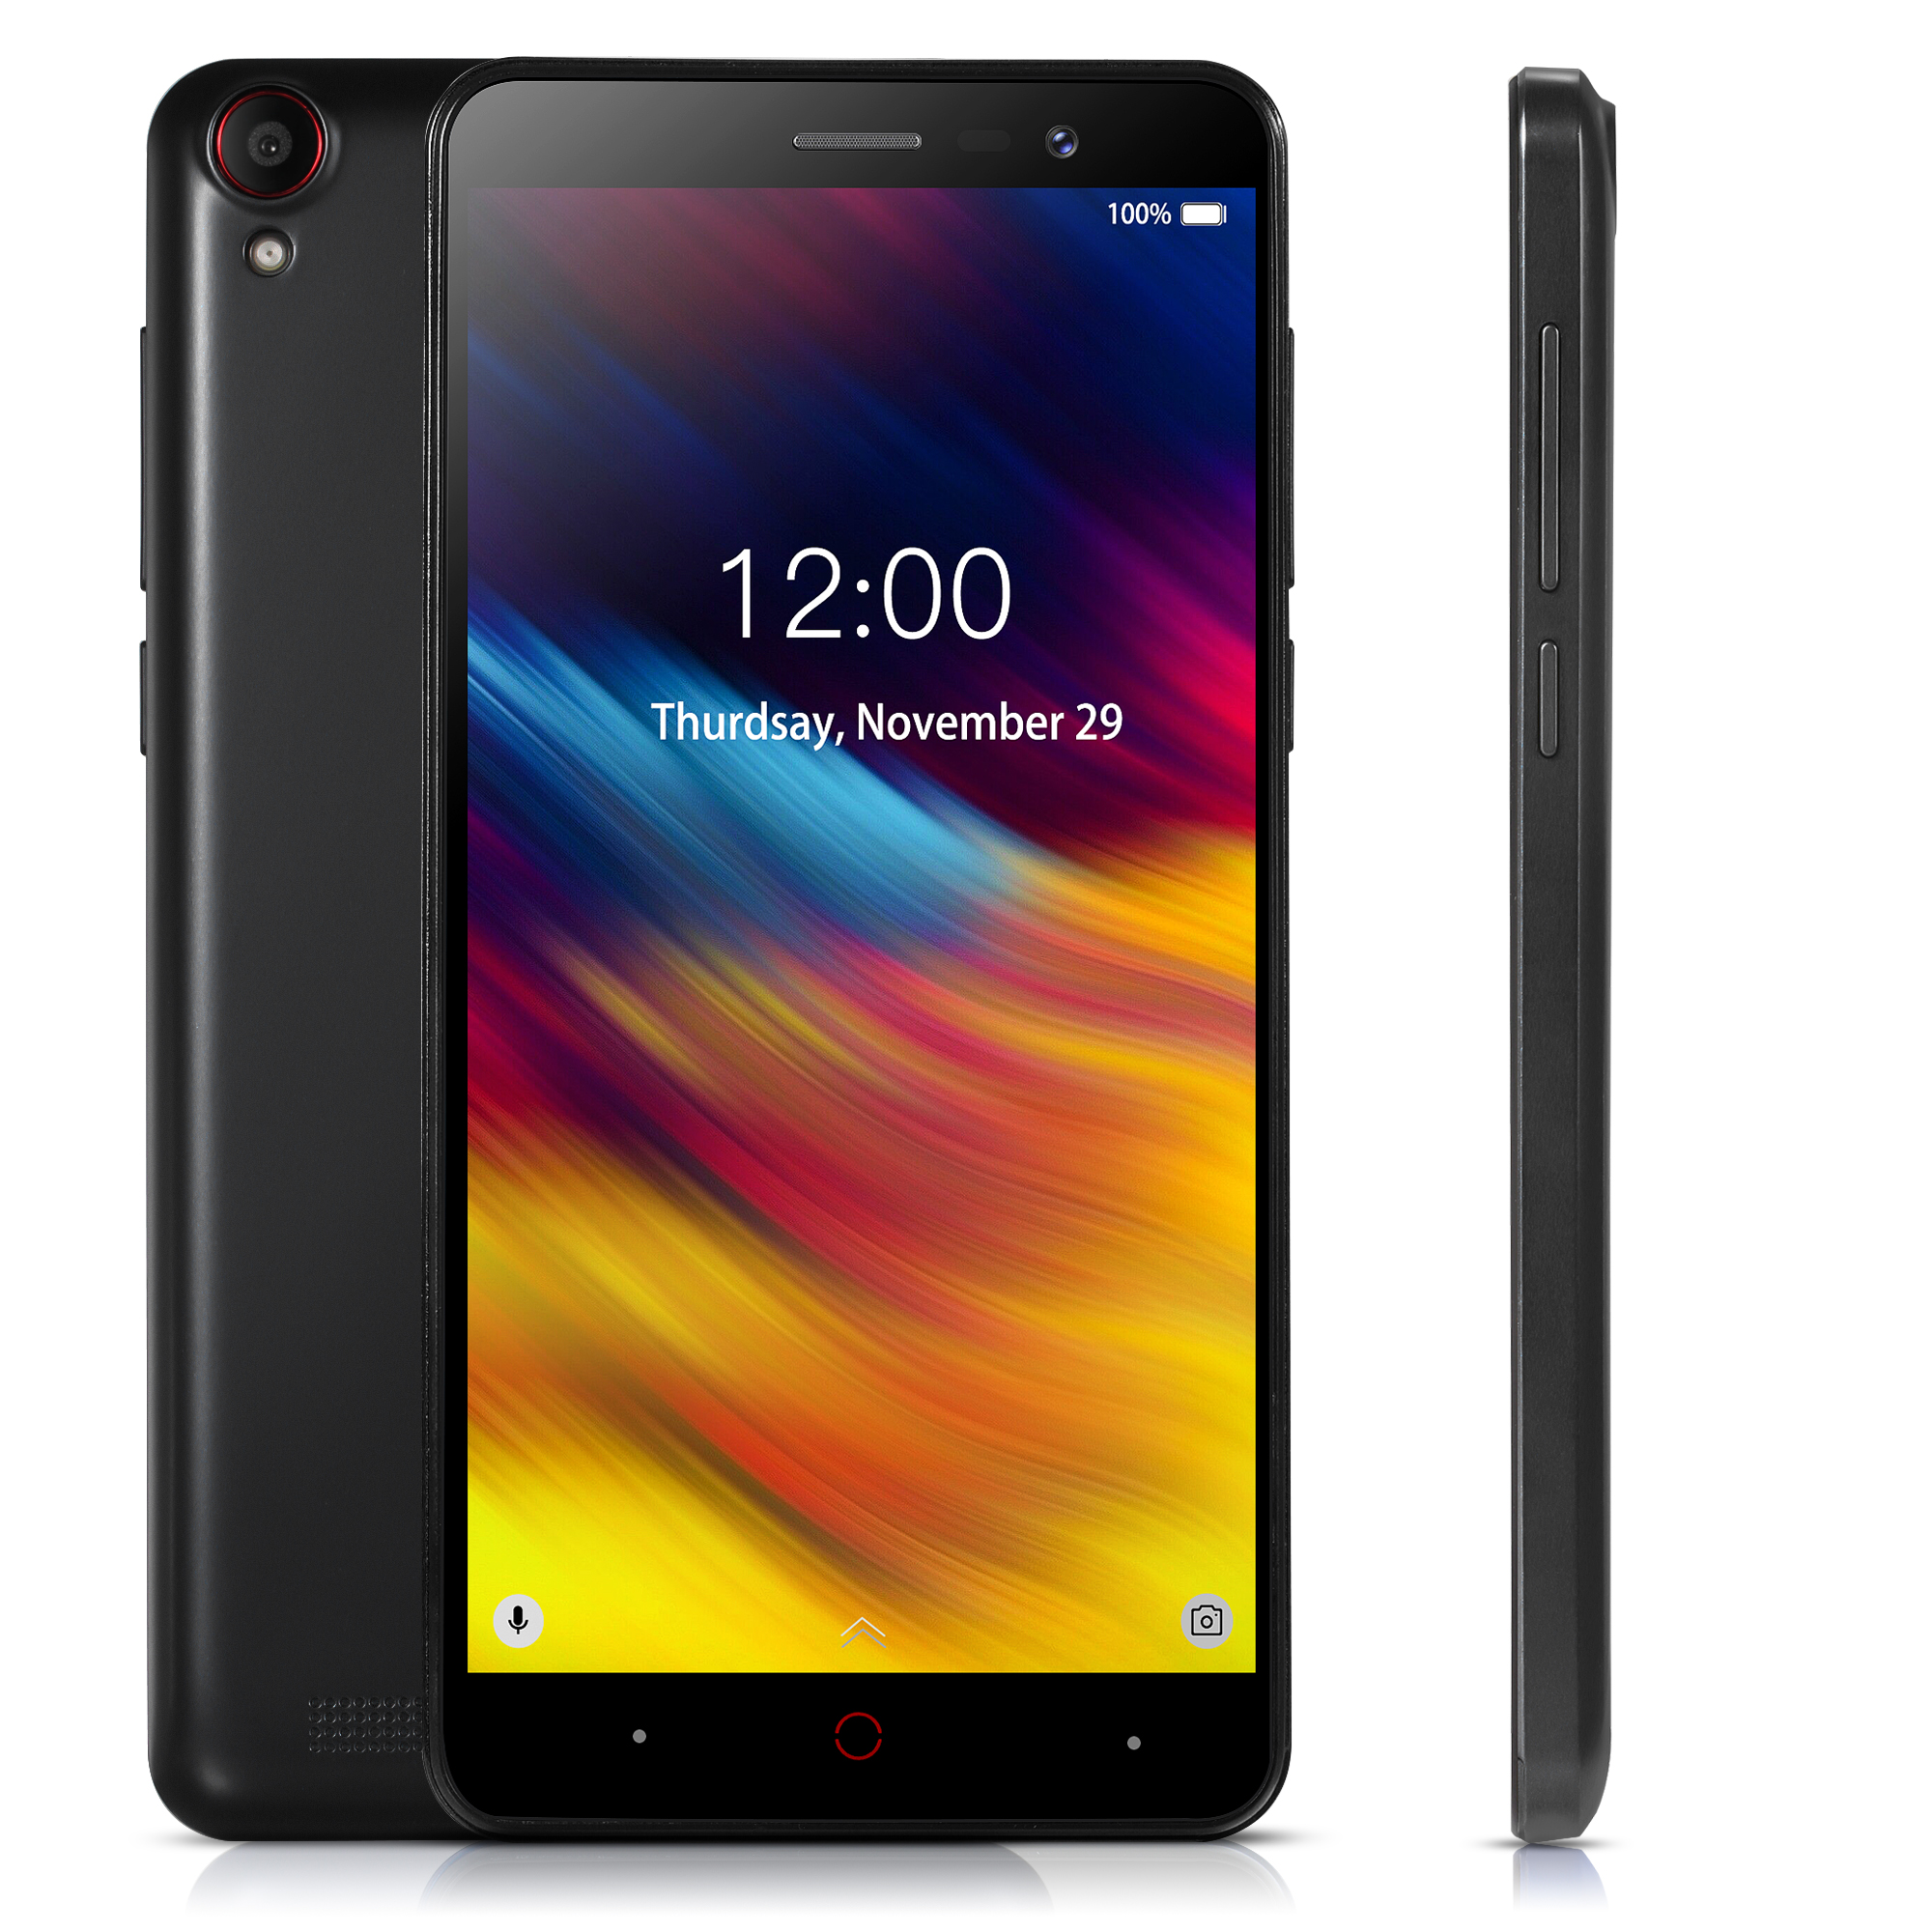 5.0 pouces Doogee X100 Android 8.1 téléphone Mobile 3G WCDMA MTK6580 Quad Core 1 GB RAM 8 GB ROM 5.0MP Smartphone double SIM 4000 mAh GPS